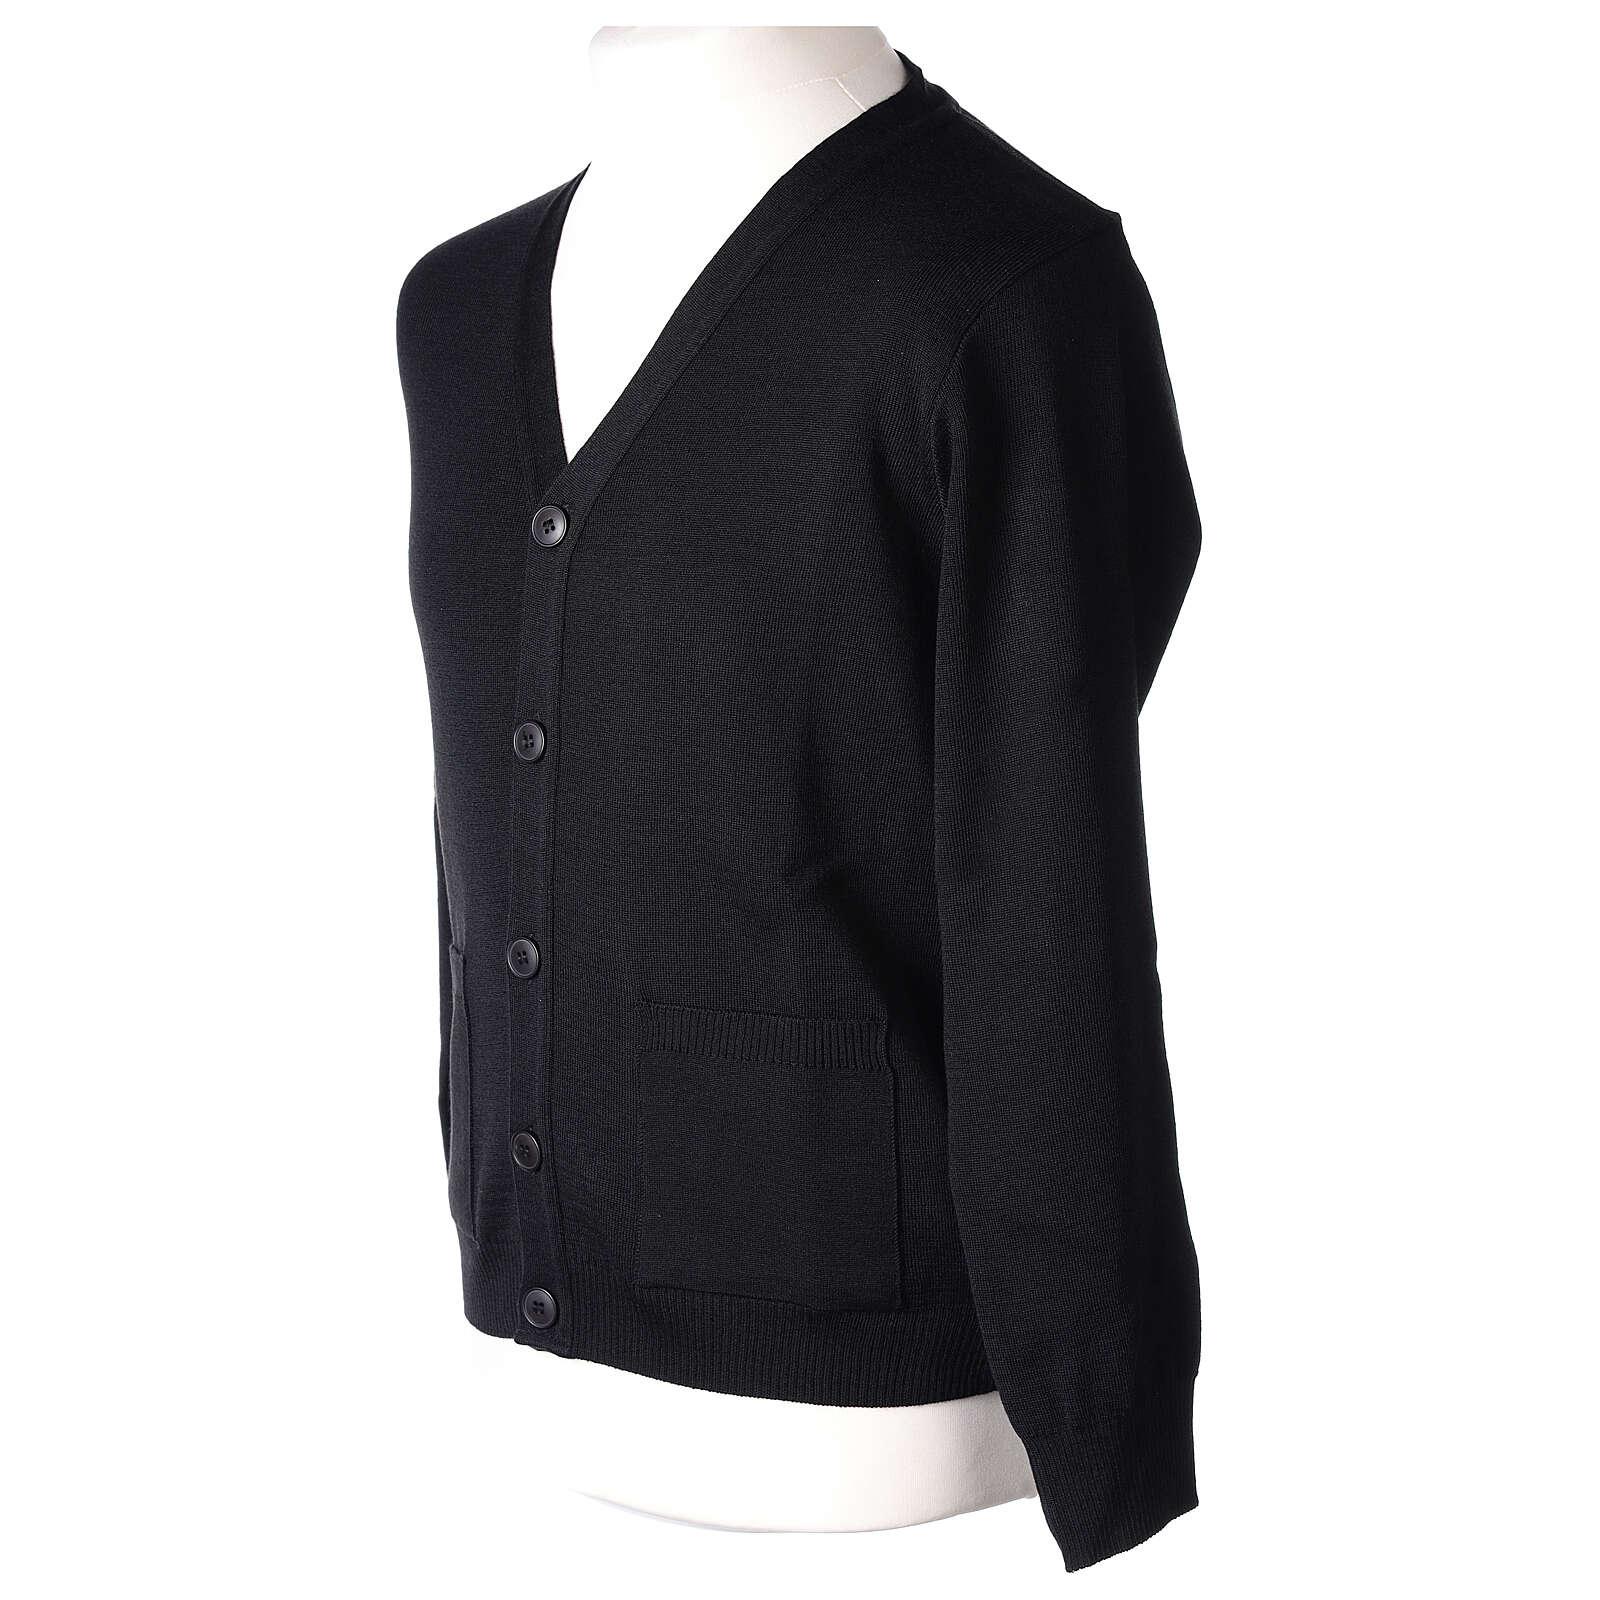 Casaco de malha sacerdote preto bolsos e botões 50% lã de merino 50% acrílico In Primis 4